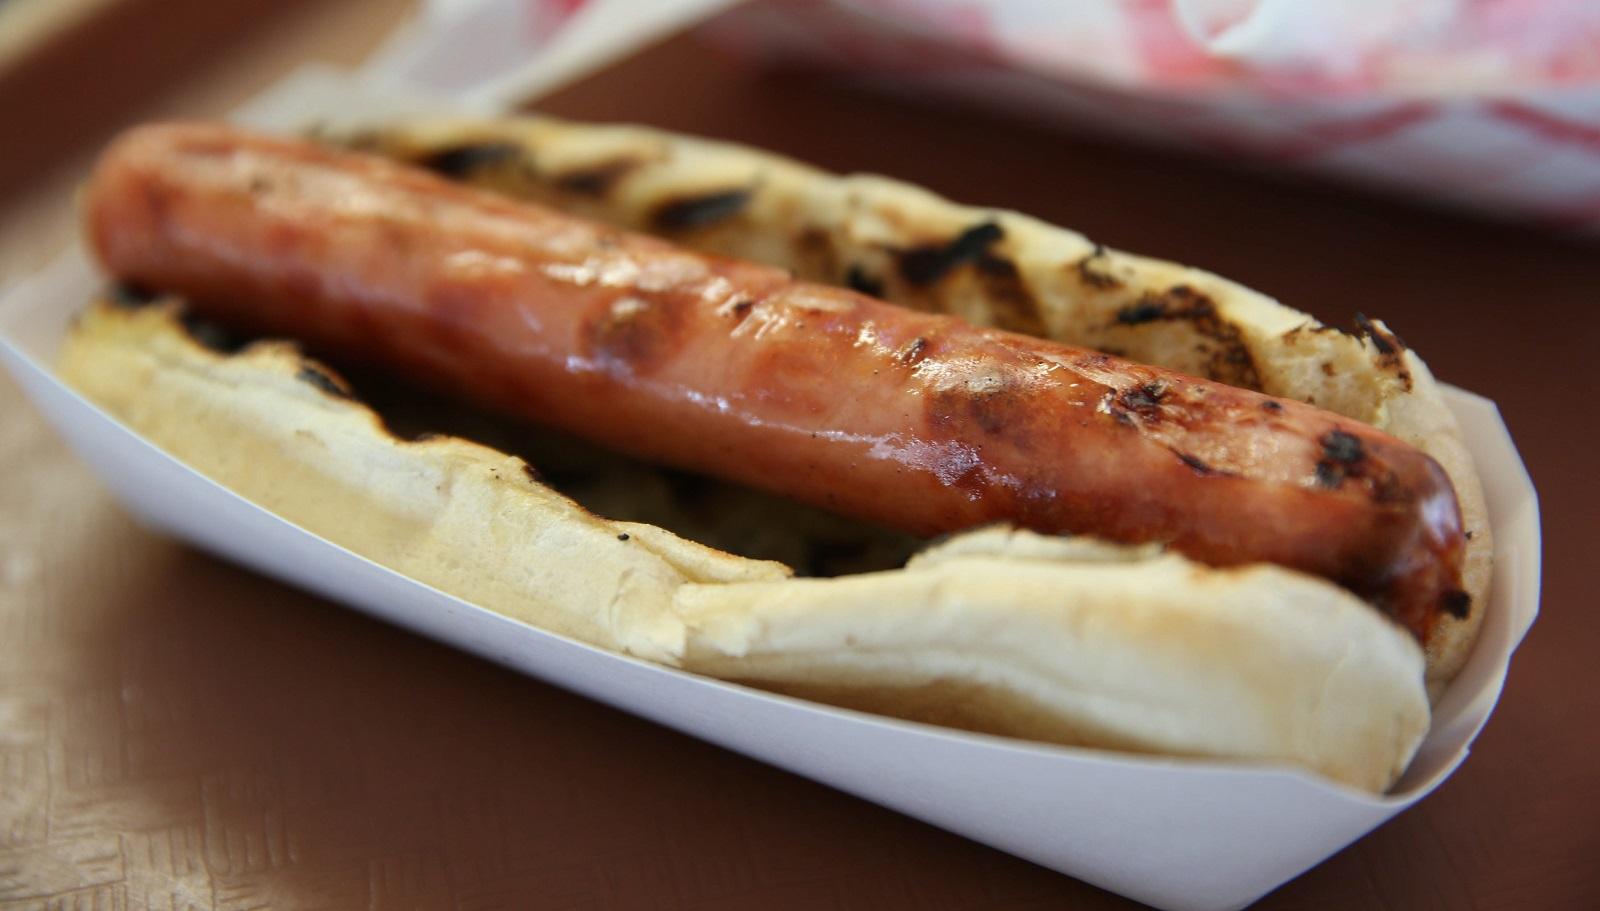 Sahlen's hot dogs will be available at Buffalo's Famous. (Sharon Cantillon/Buffalo News)